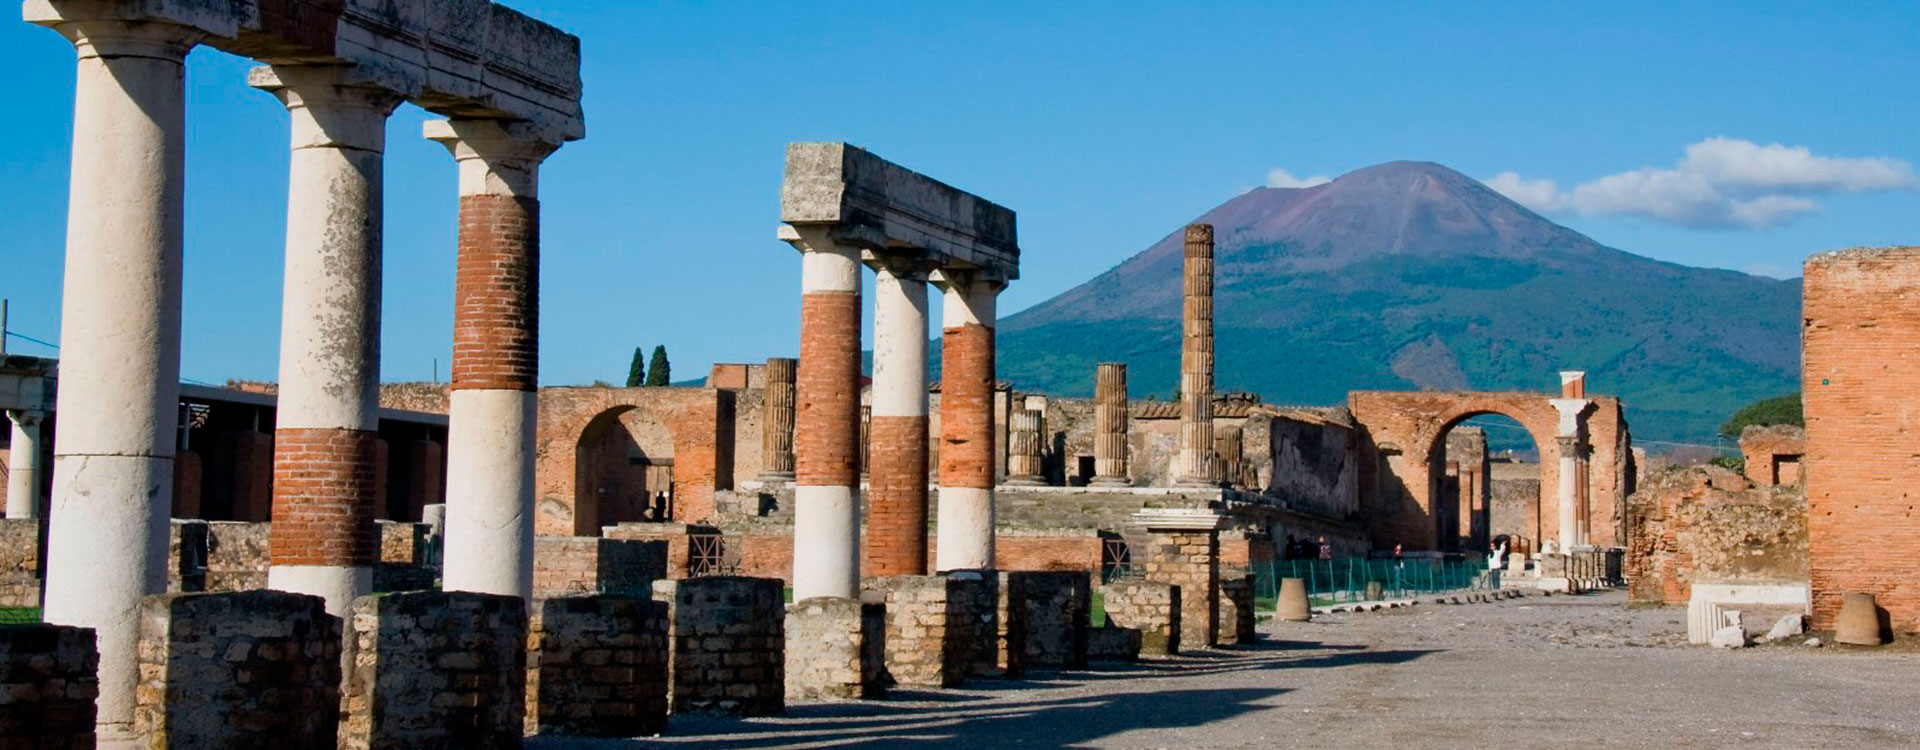 Parco Archeologico di Pompei - Artecard